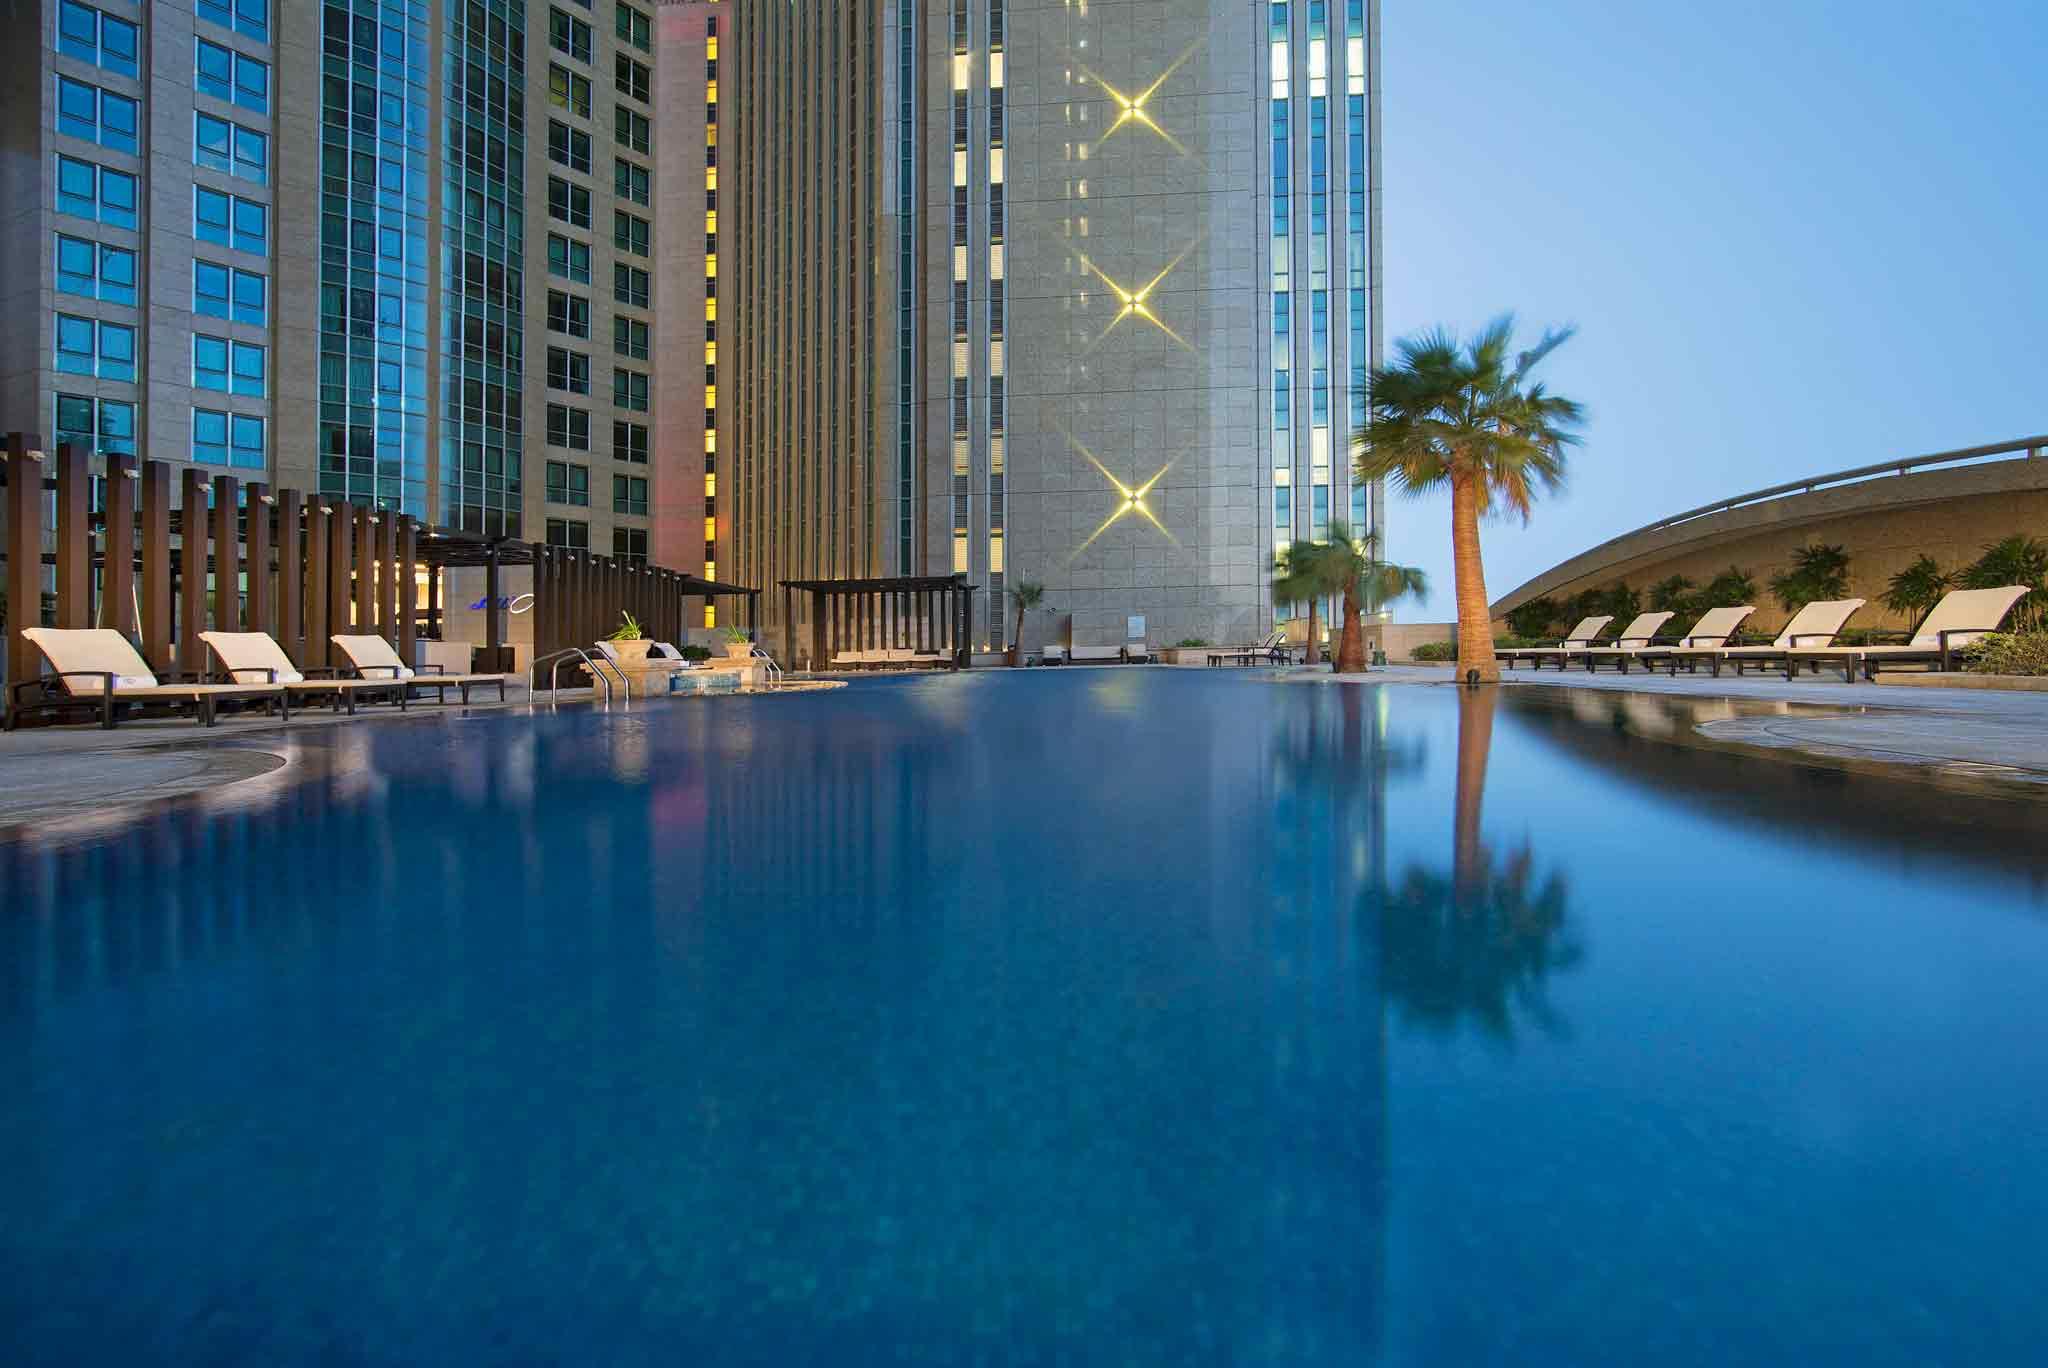 Sofitel Abu Dhabi Corniche Erholungszentrum